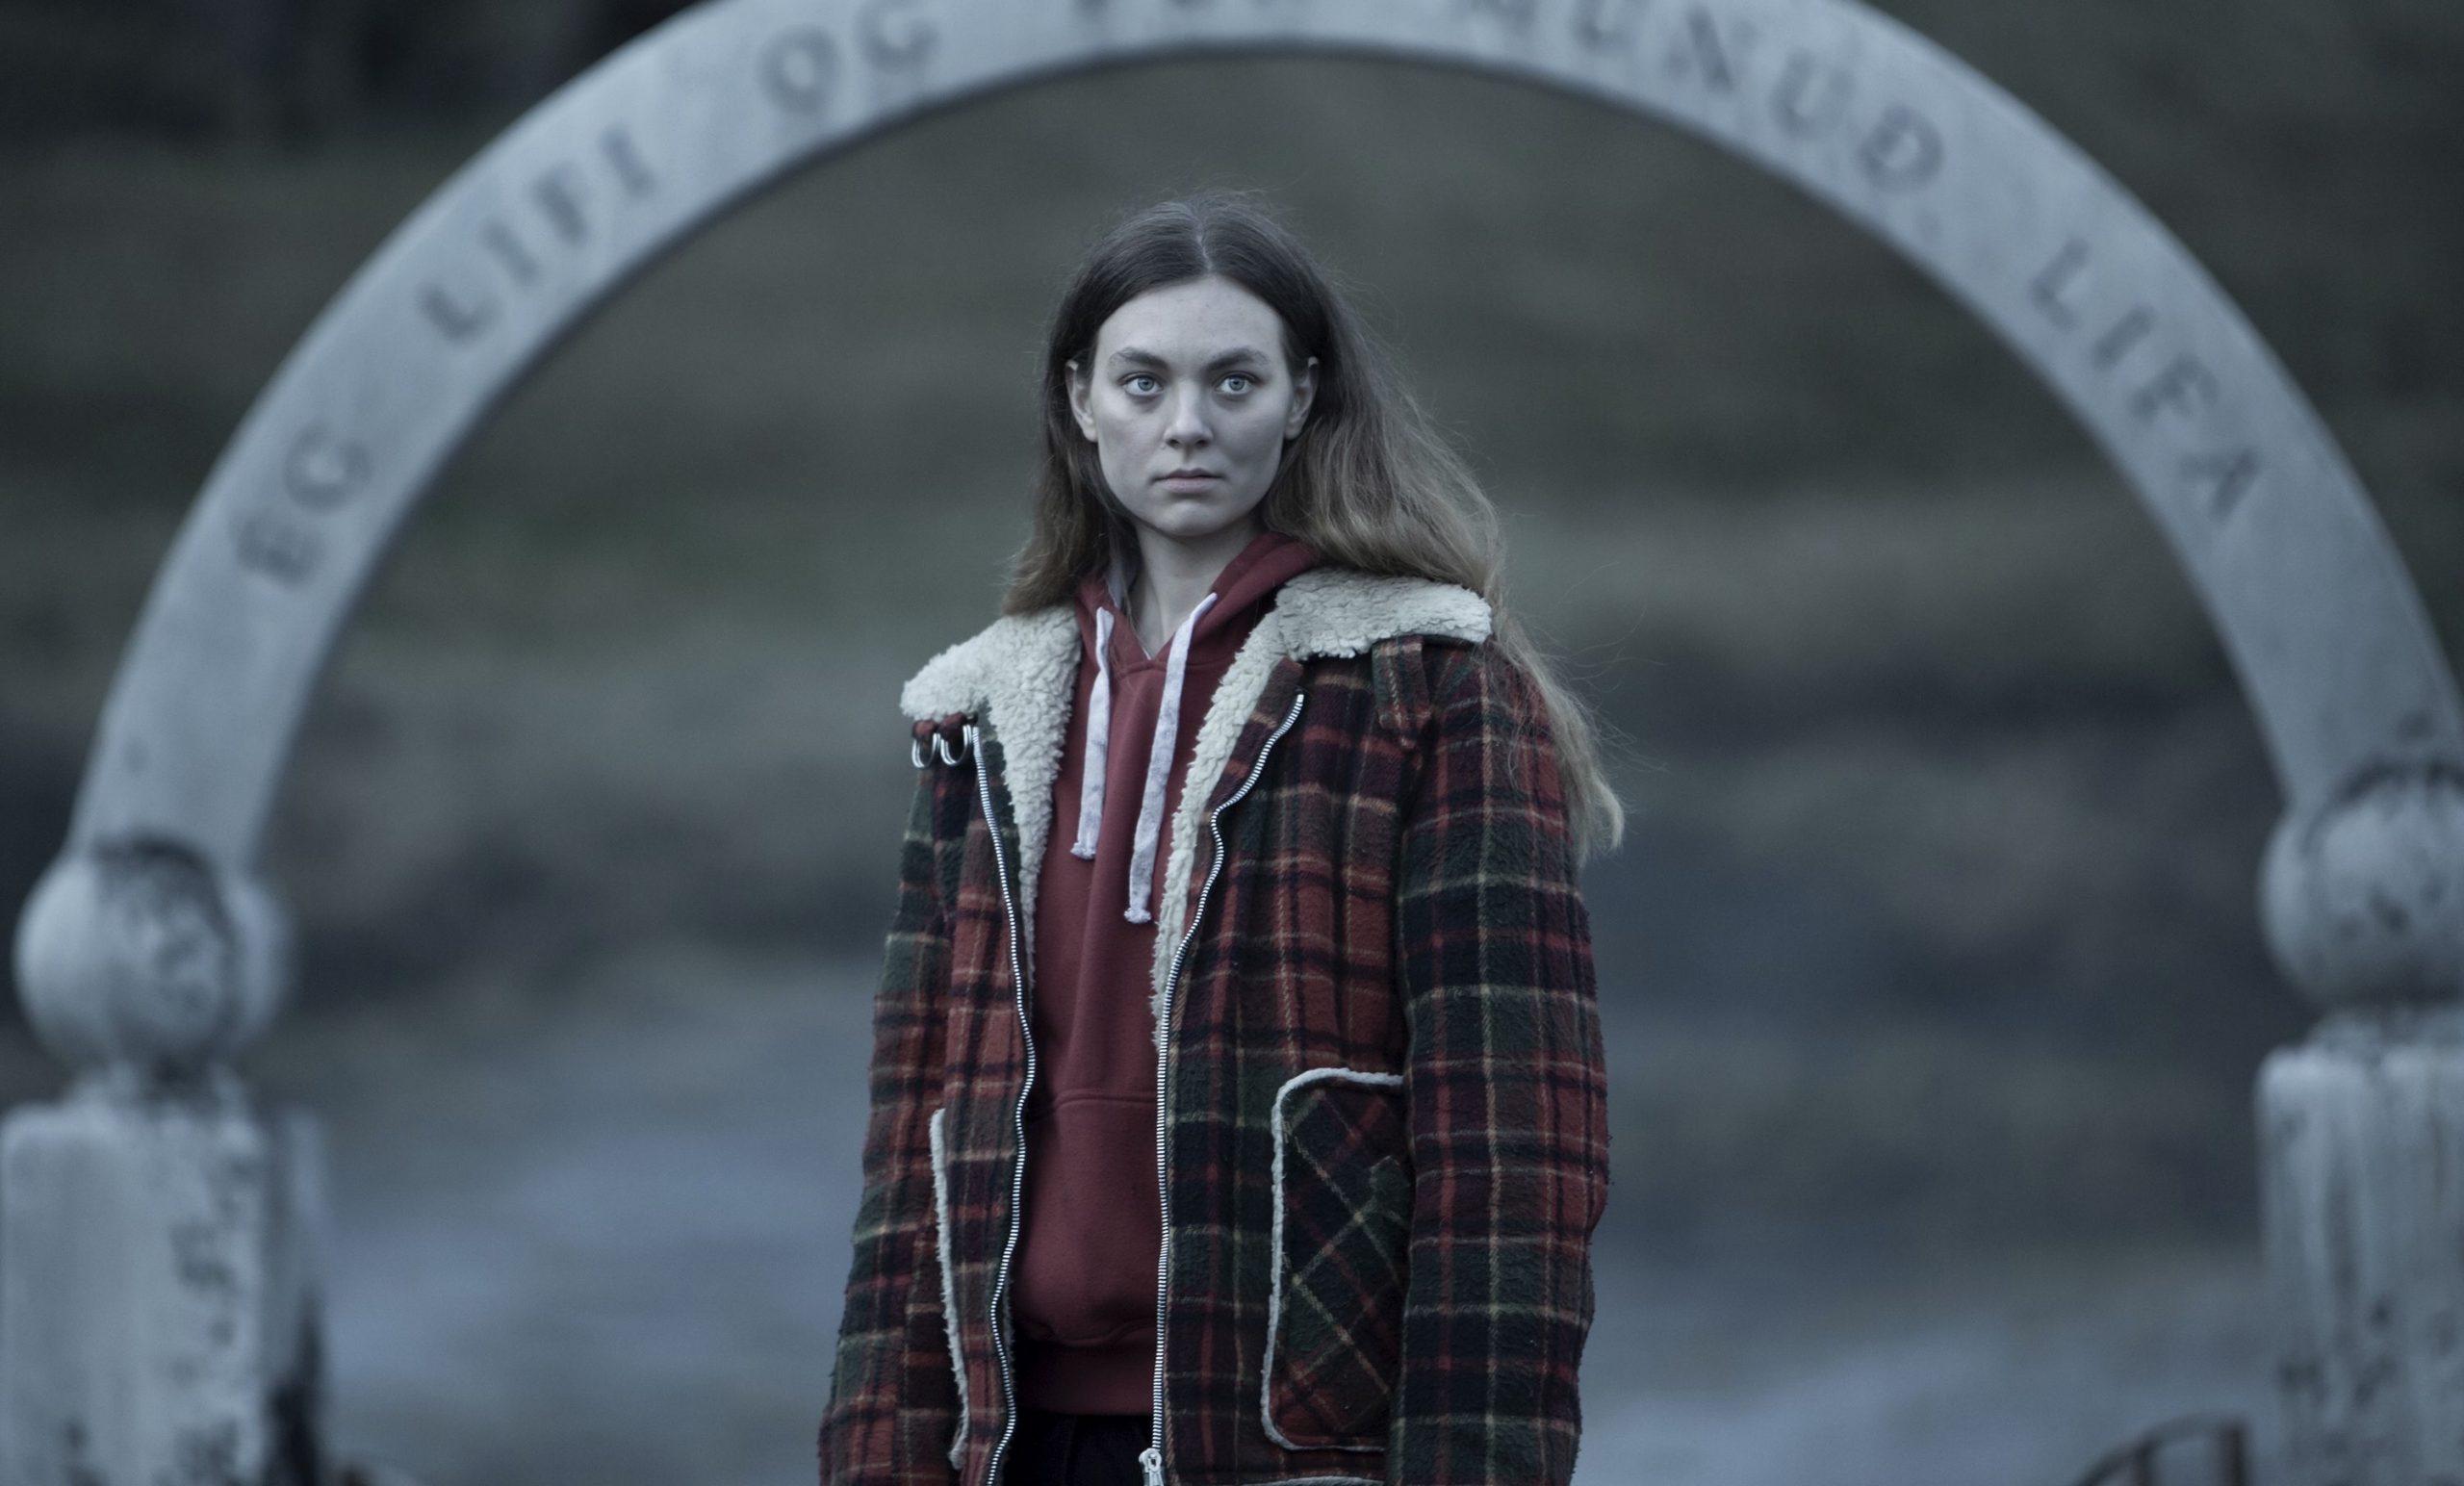 'Katla', critic: the Netflix series shows a new dimension of terror